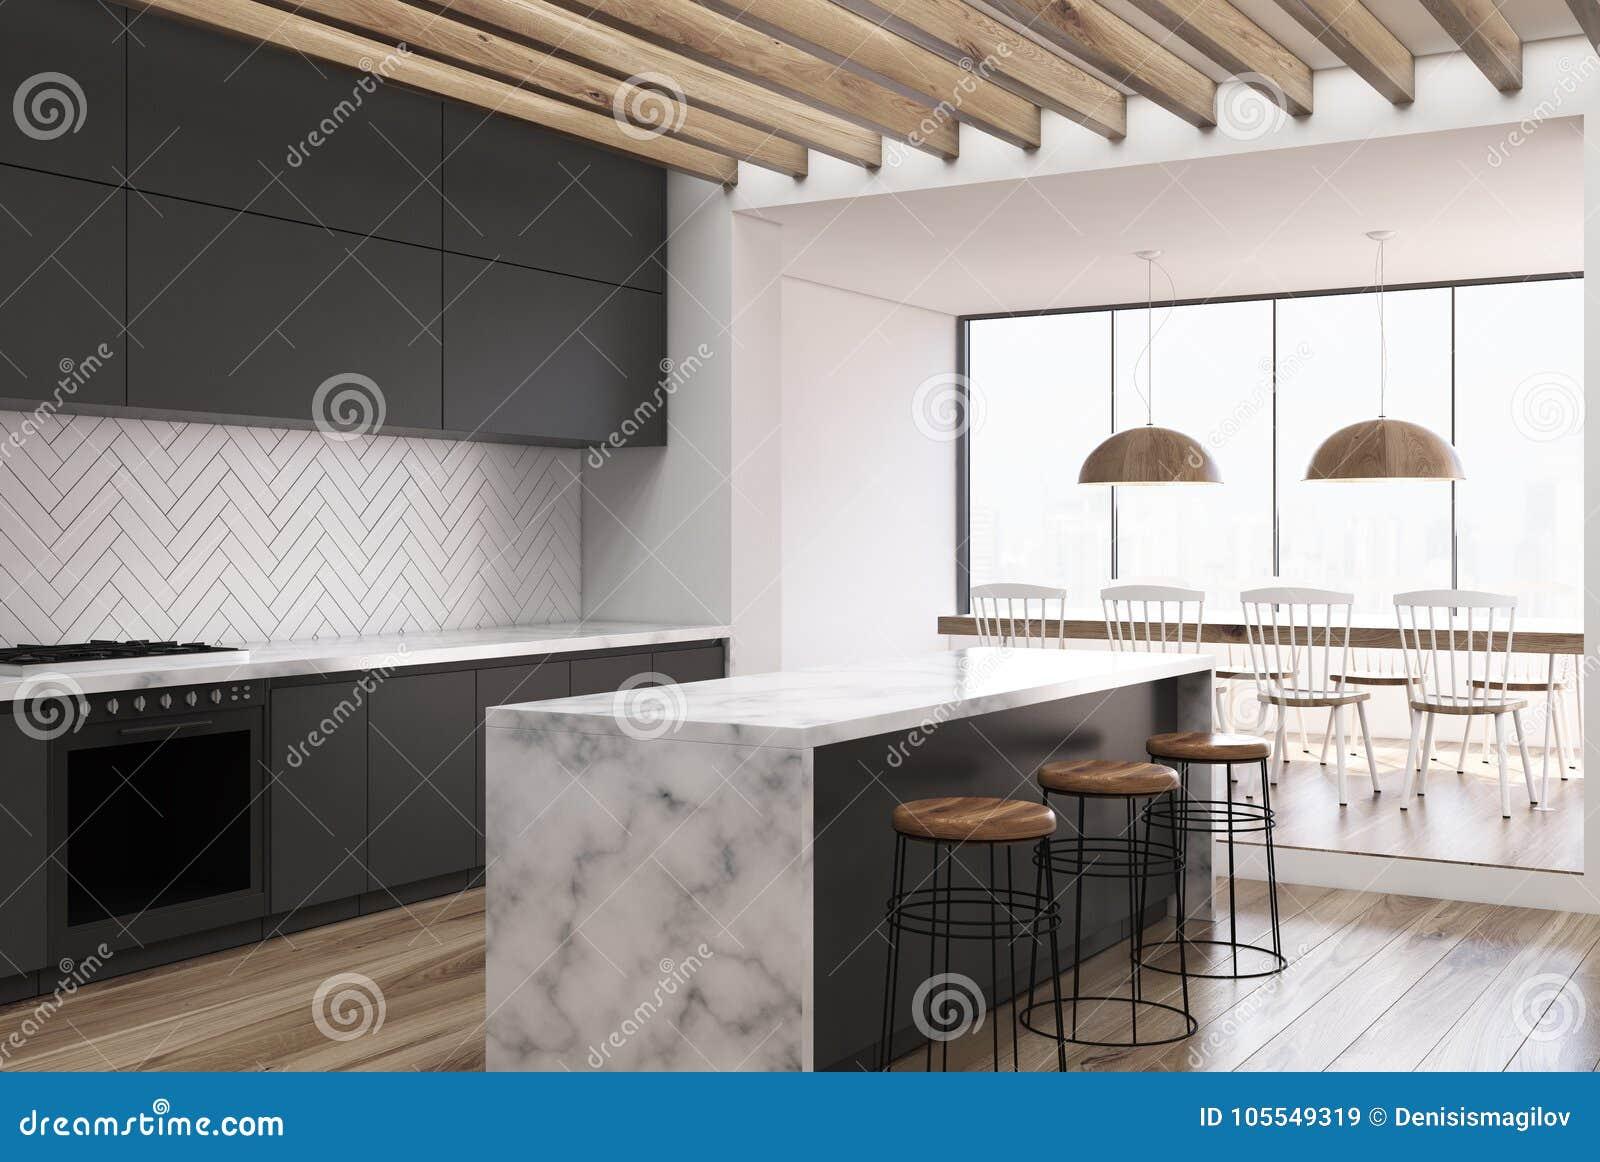 Keuken Marmer Zwart : Zwarte houten keuken marmeren barkant stock illustratie